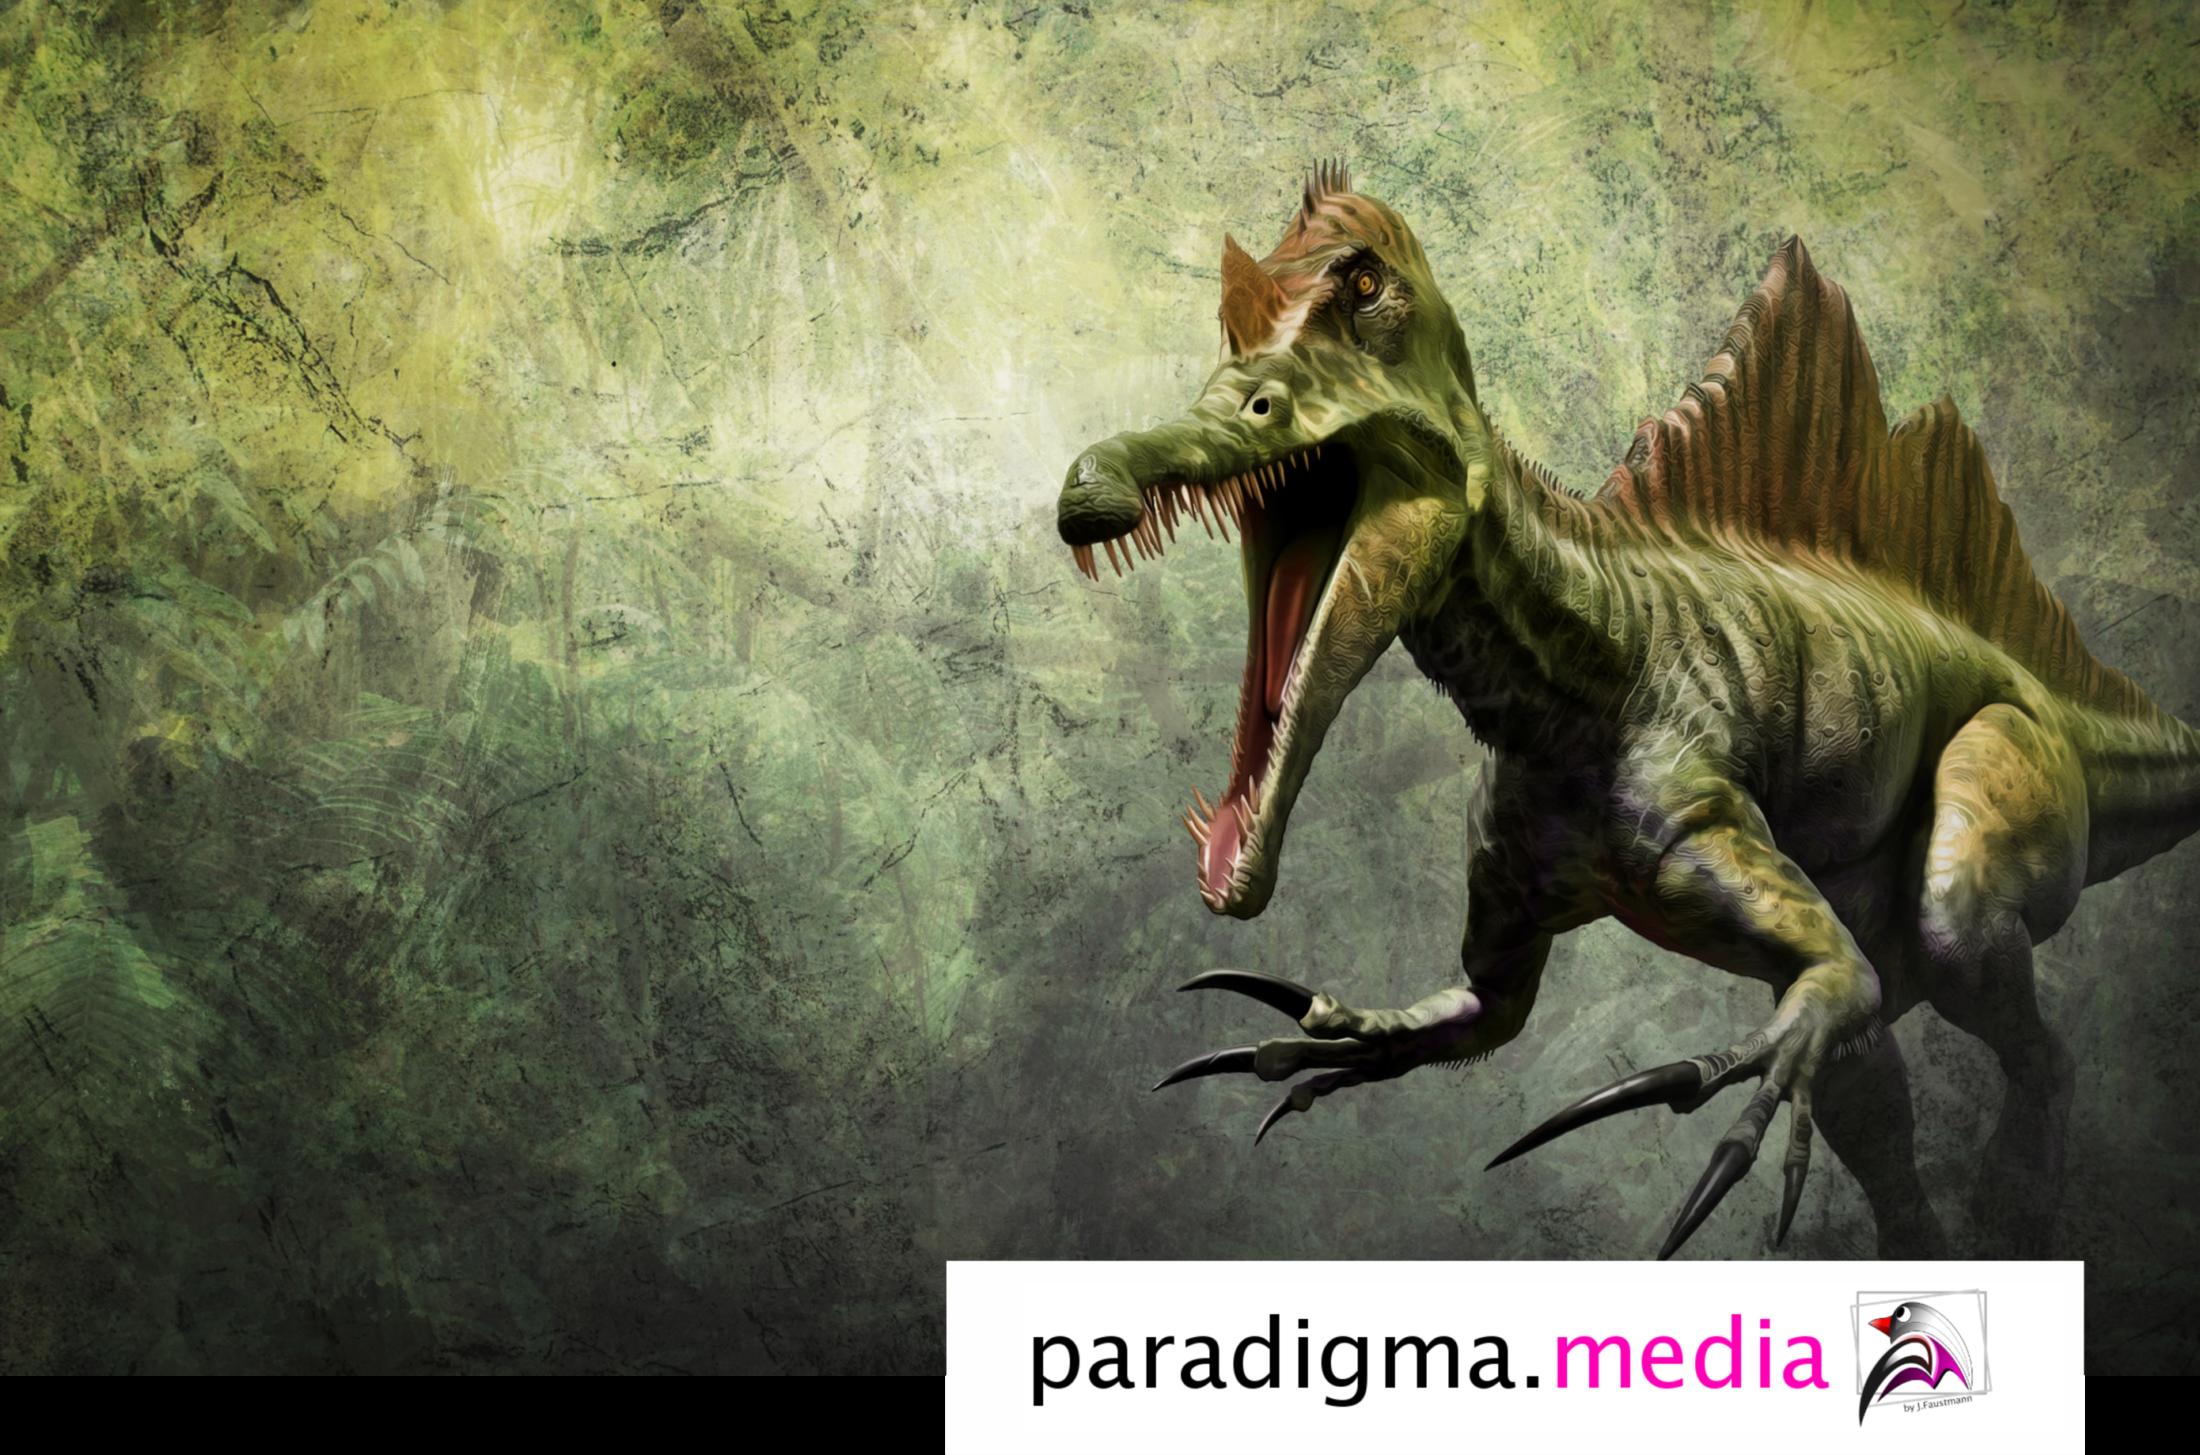 Grafikdesign Paradigma.media Werbung Berlin